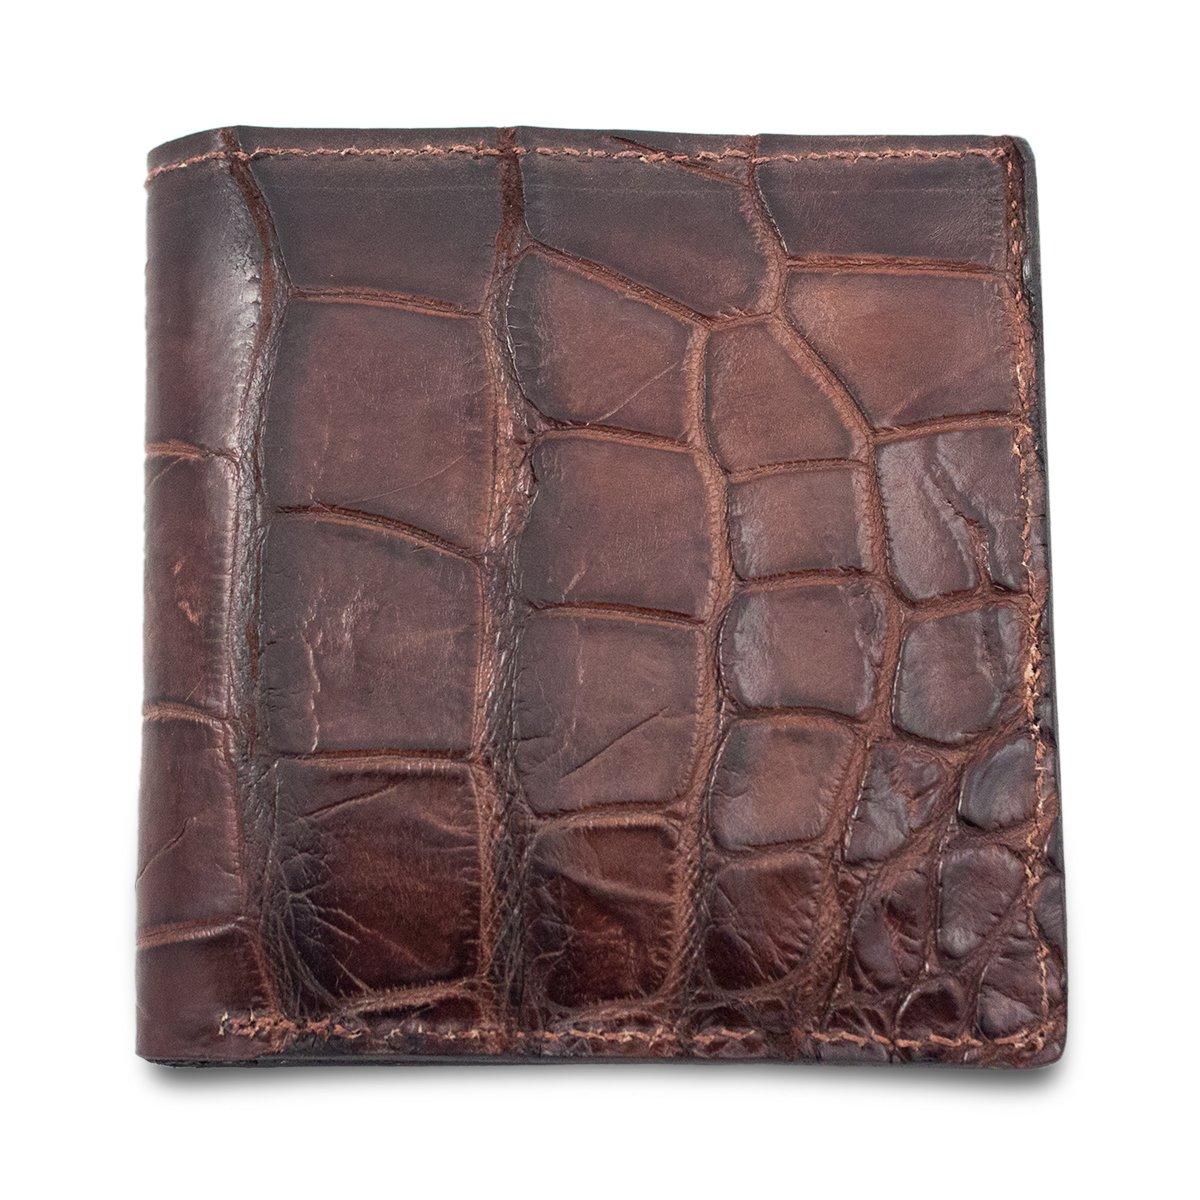 Genuine Alligator Skin Hipster Bifold Leather Wallet Handmade with 12 Card Slots